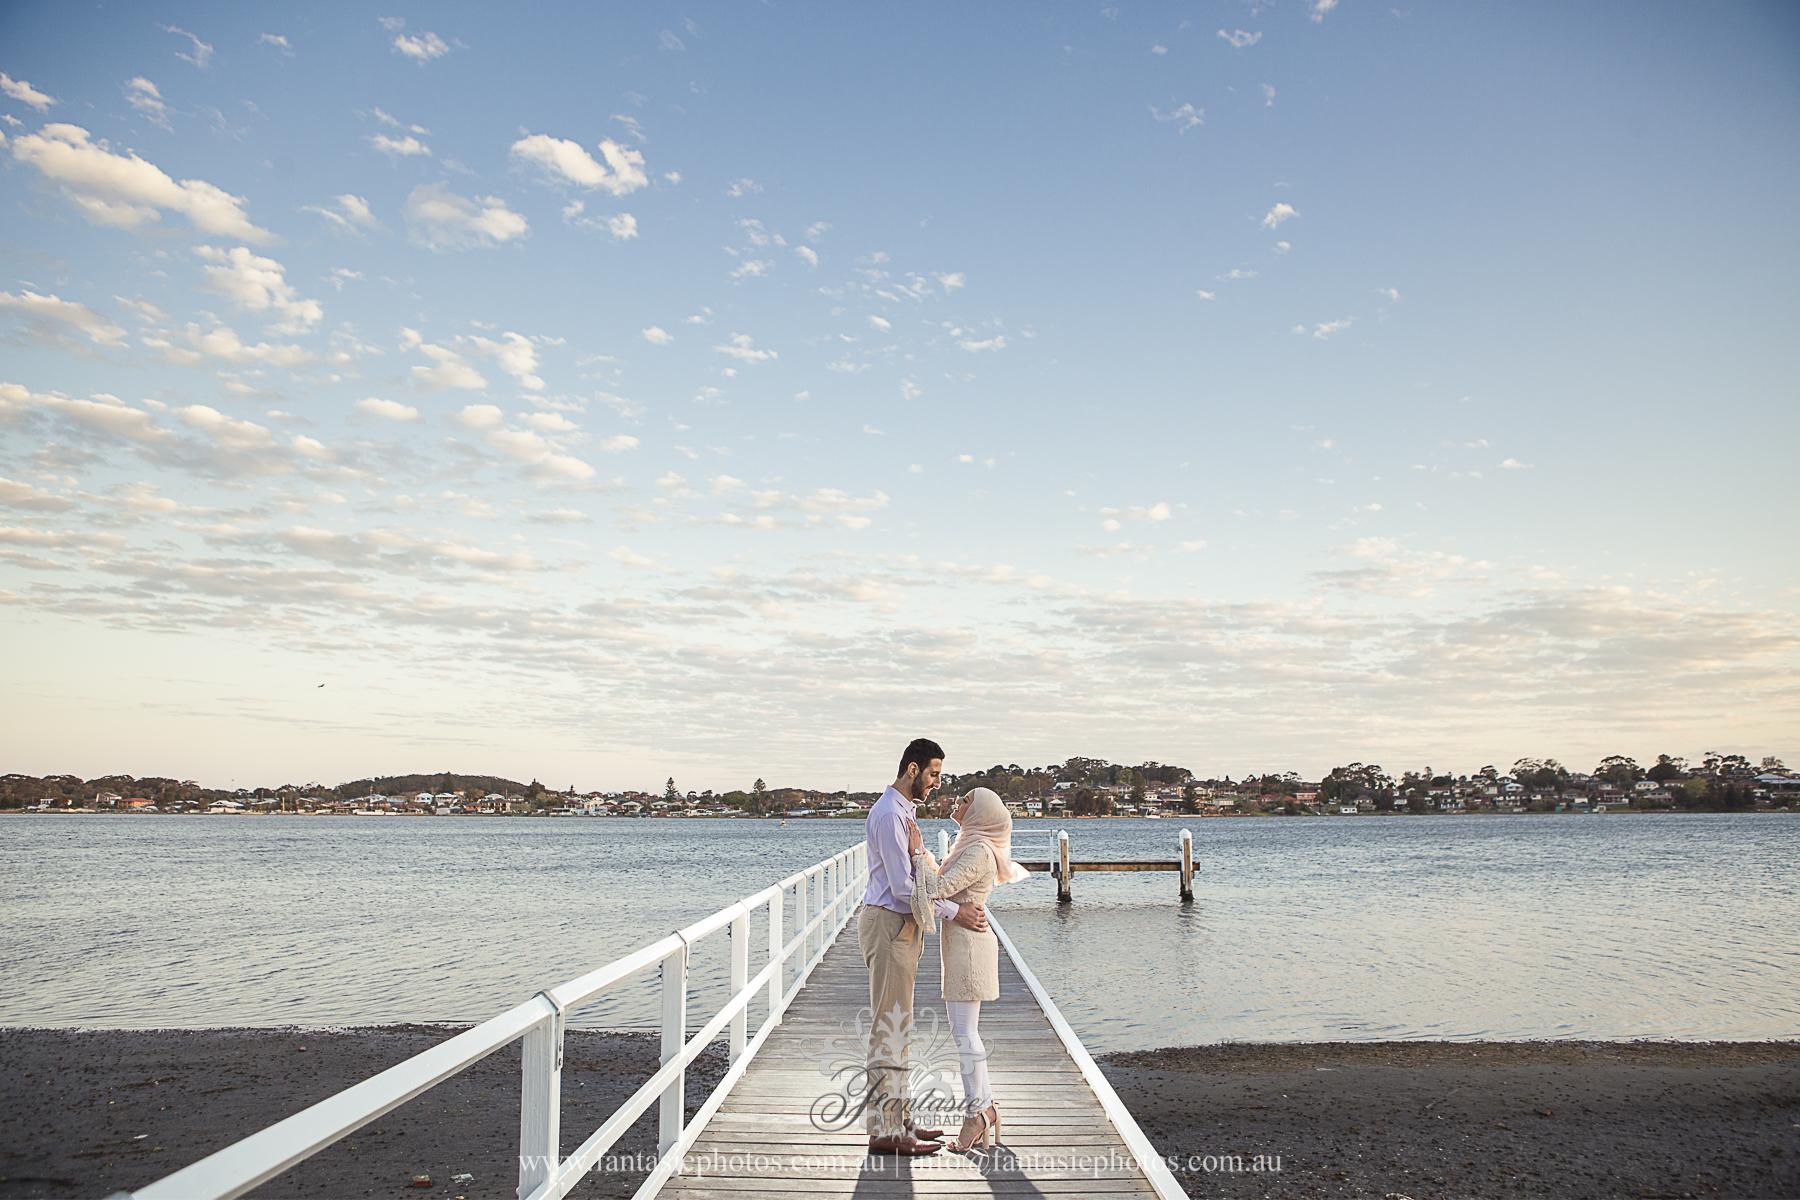 Wedding Photography Wollongong Jetty | Fantasie Photography